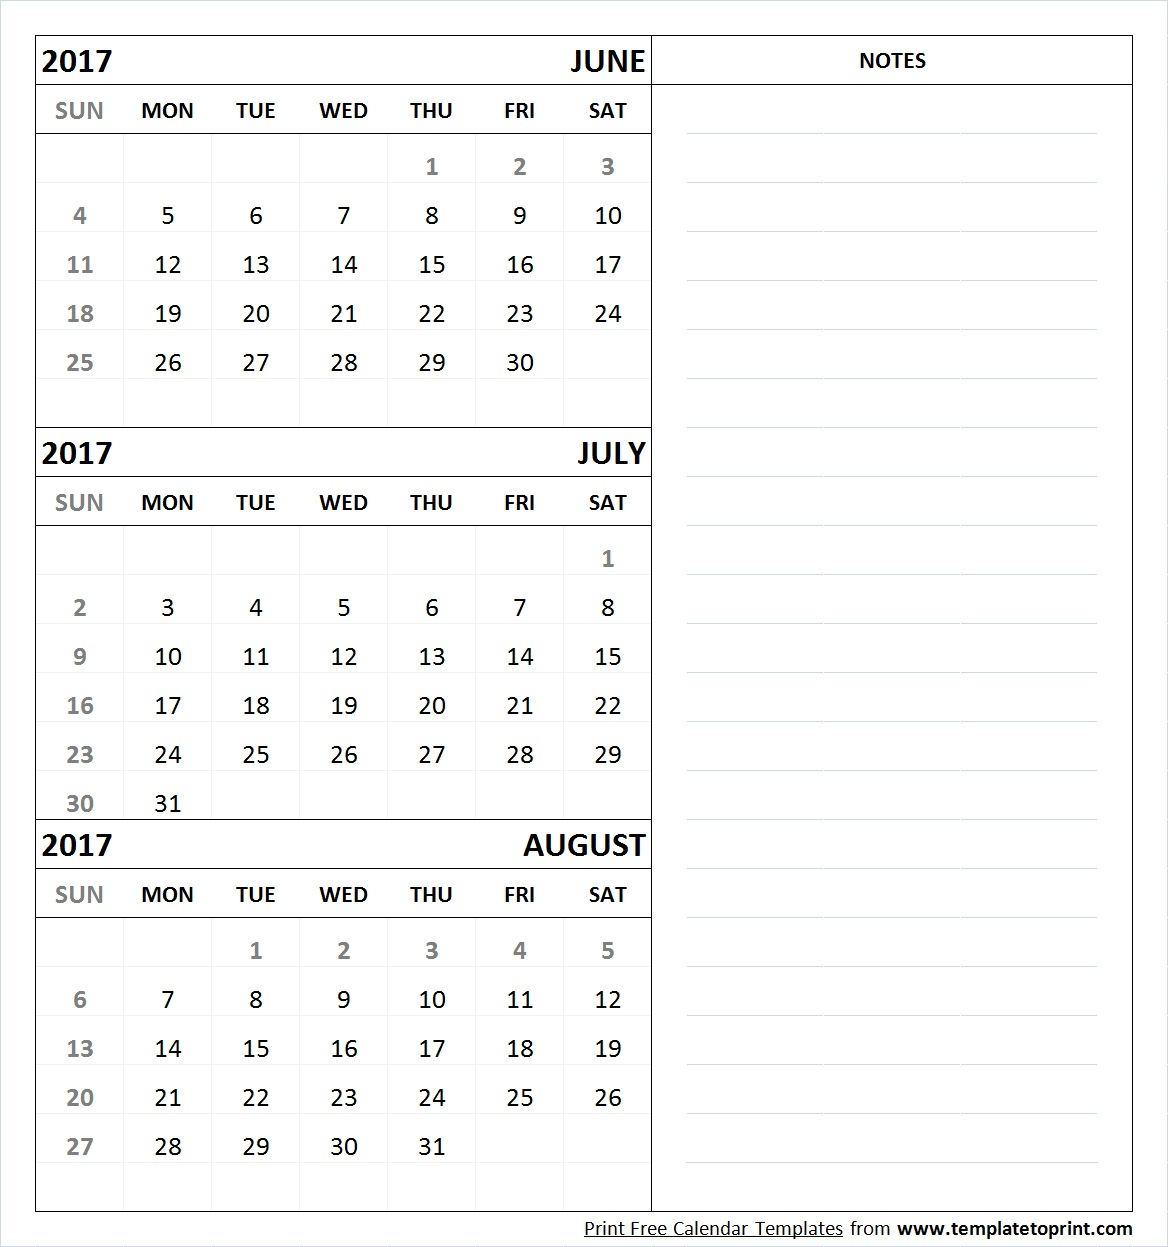 June July August 2017 Calendar Printable Template Pdf for Template June July August